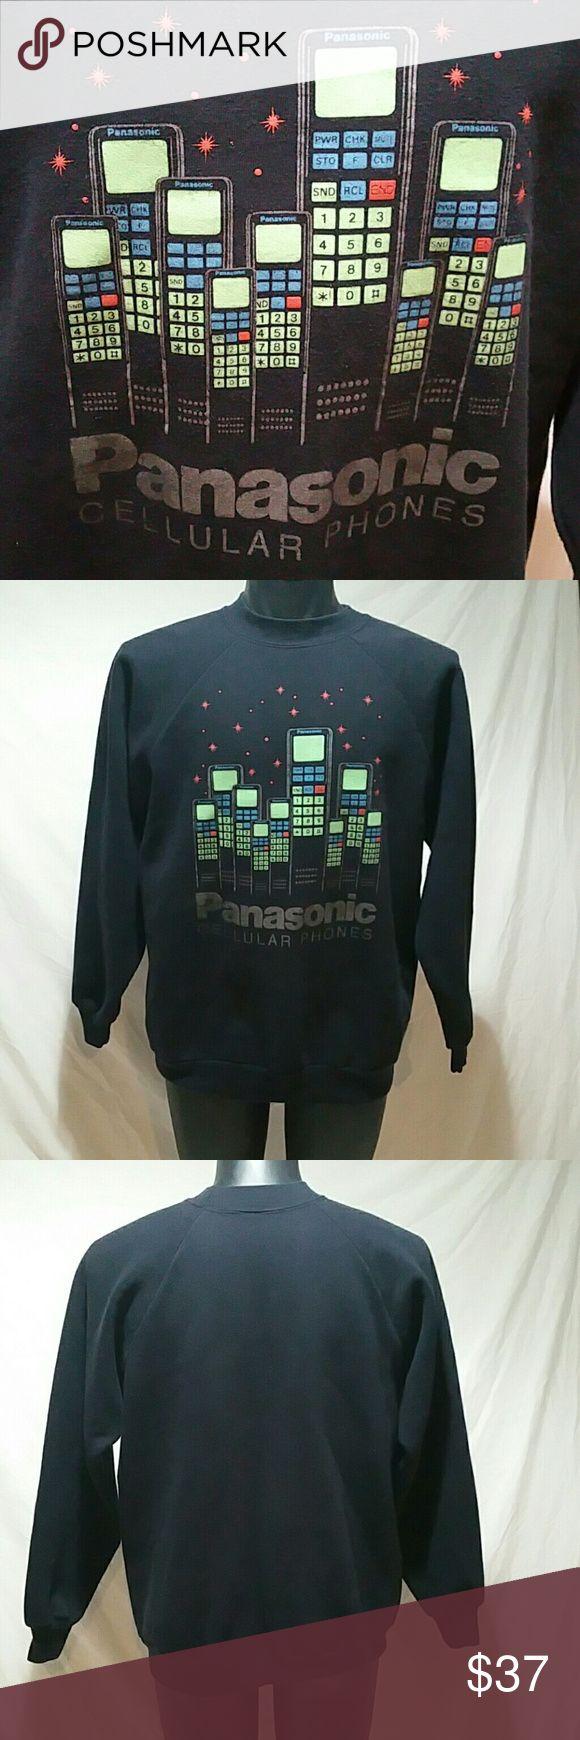 Shirt design measurements - Vintage Celluar Phone Panasonic Promo Sweat Shirt